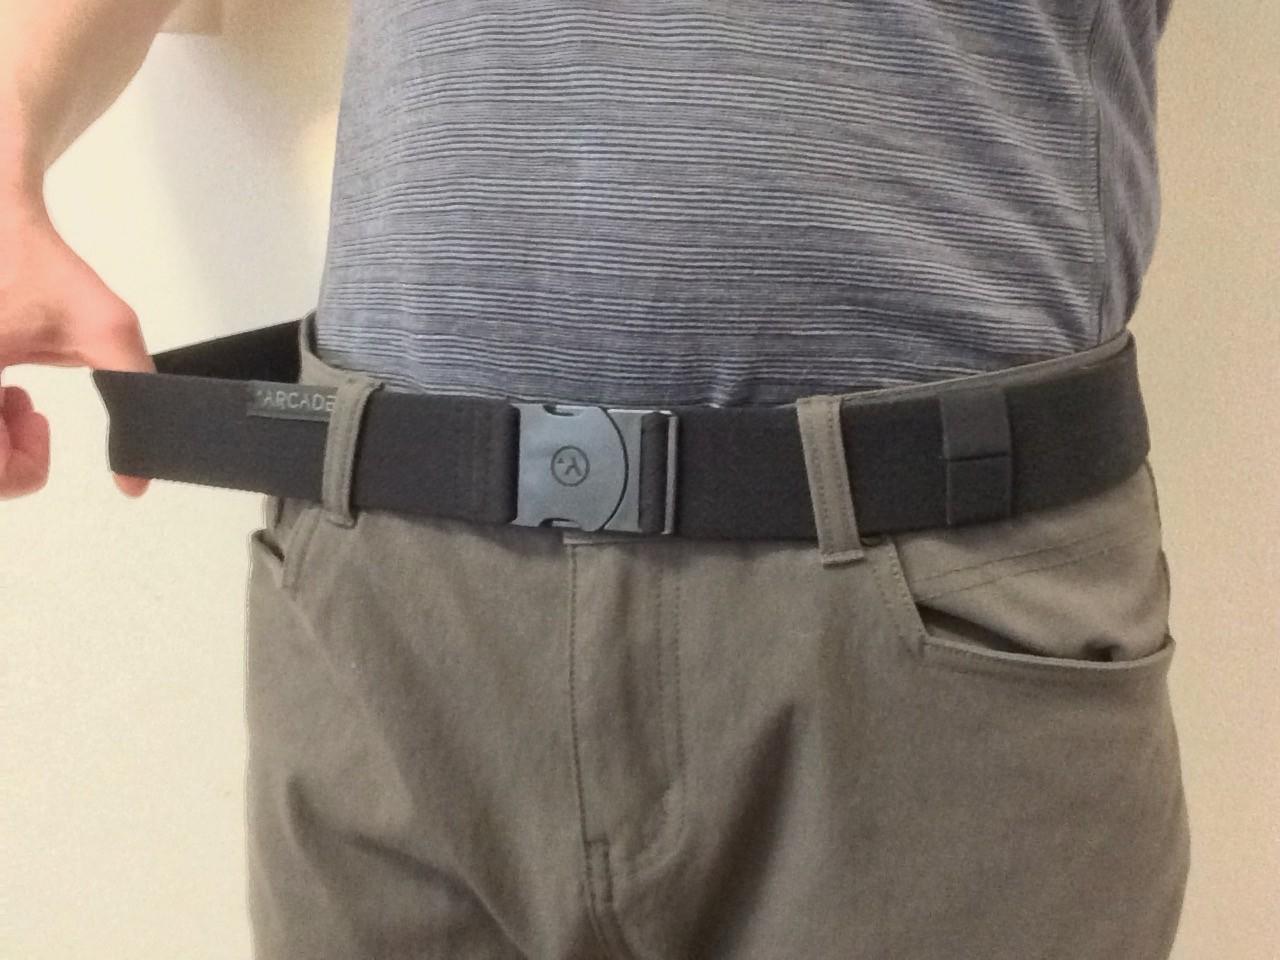 Arcade Belt stretchiness